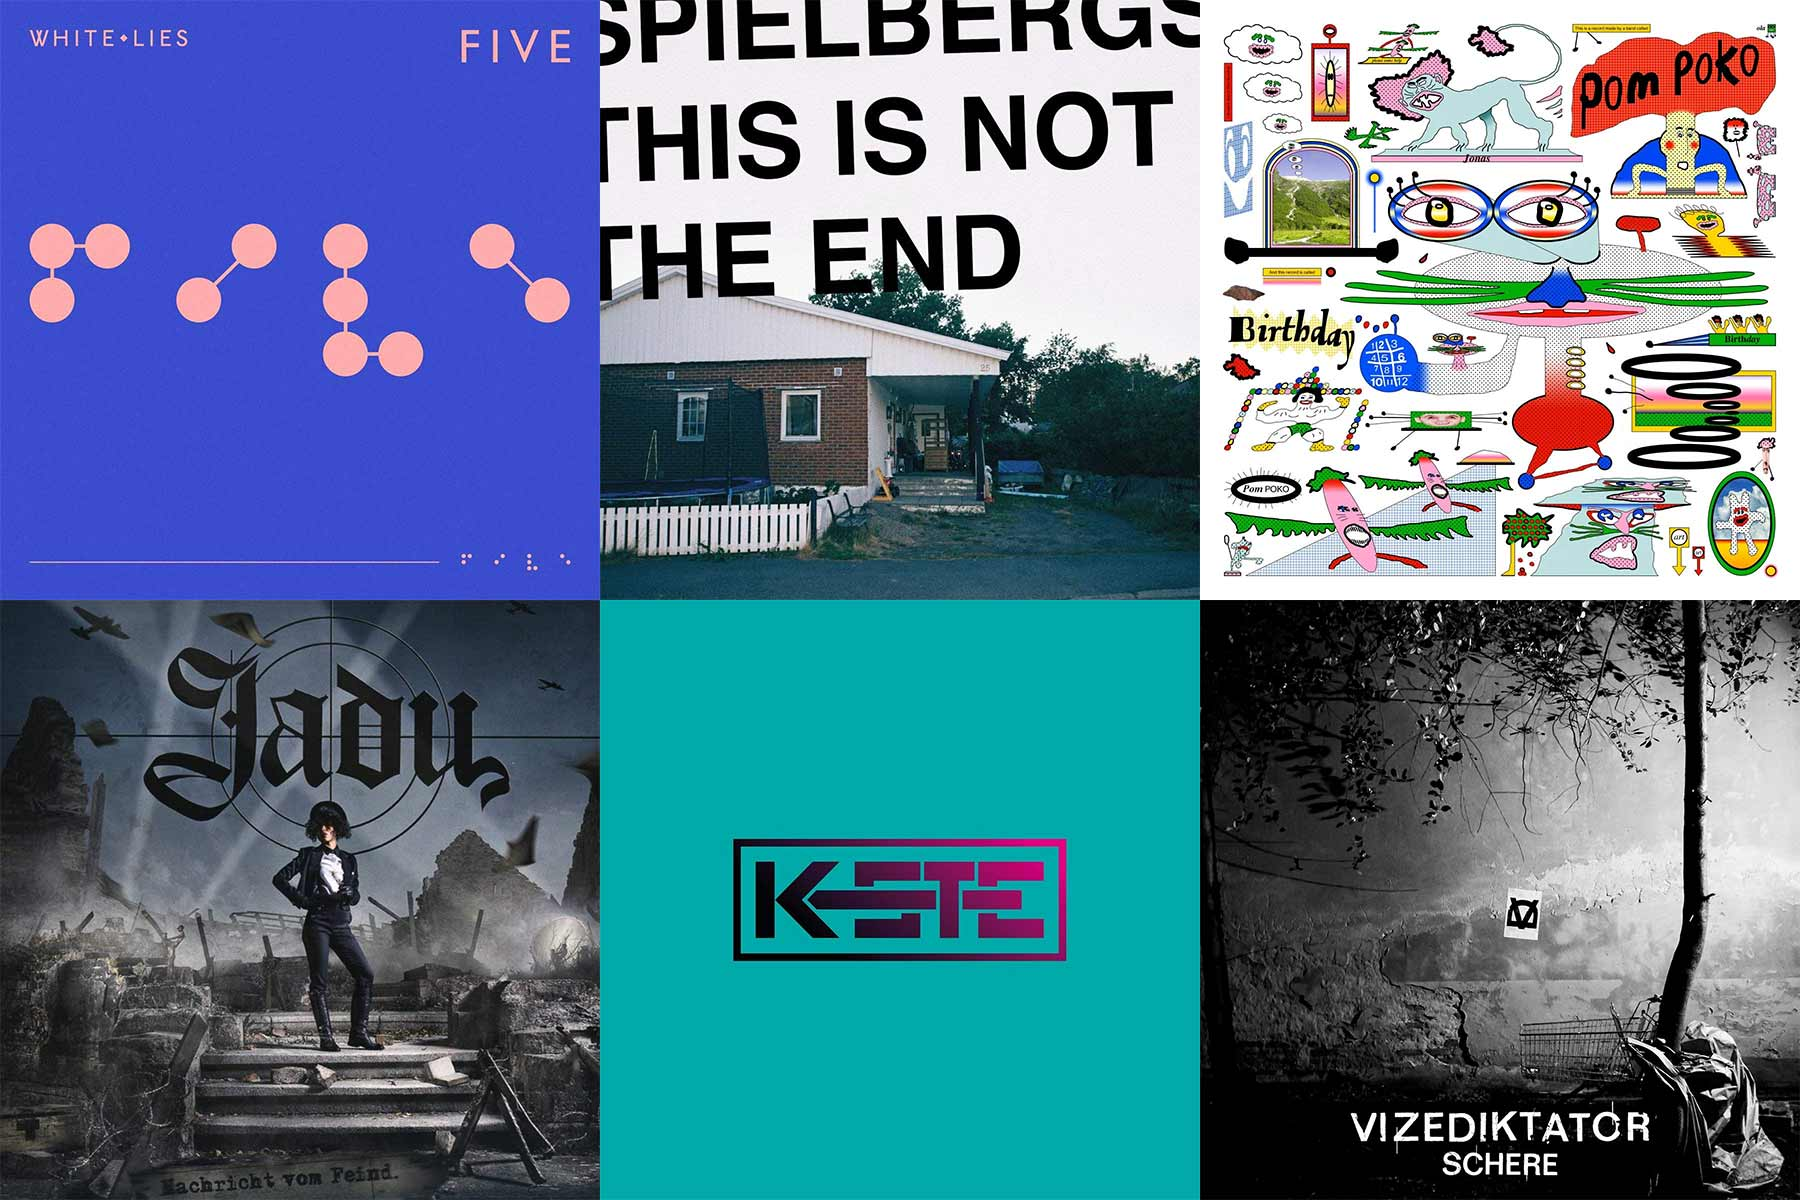 Kurzreviews: Neue Musikalben im Februar 2019 kurzreviews-neue-musikalben-februar-2019